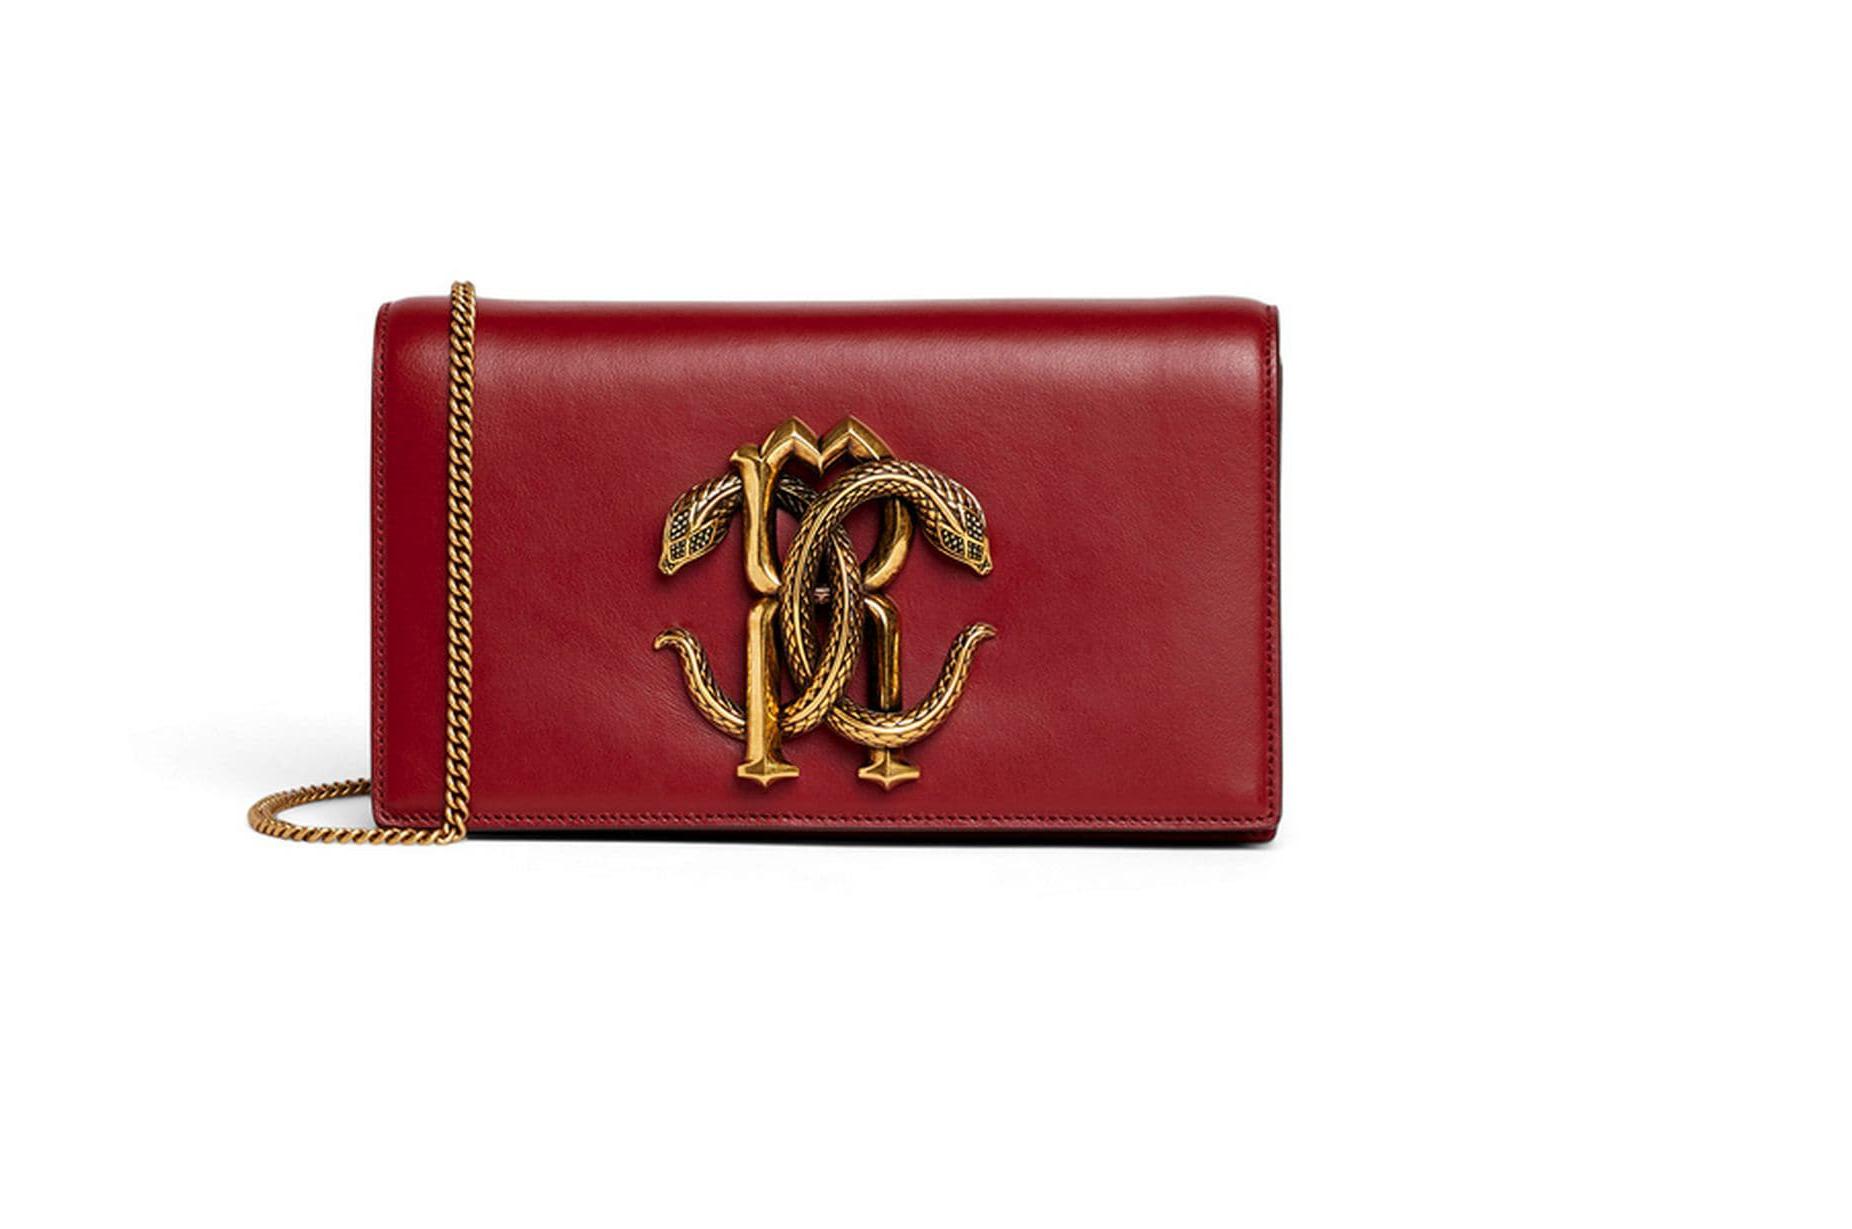 roberto-cavalli-mirror-snake-logo-shoulder-bag_12944884_14226373_2048